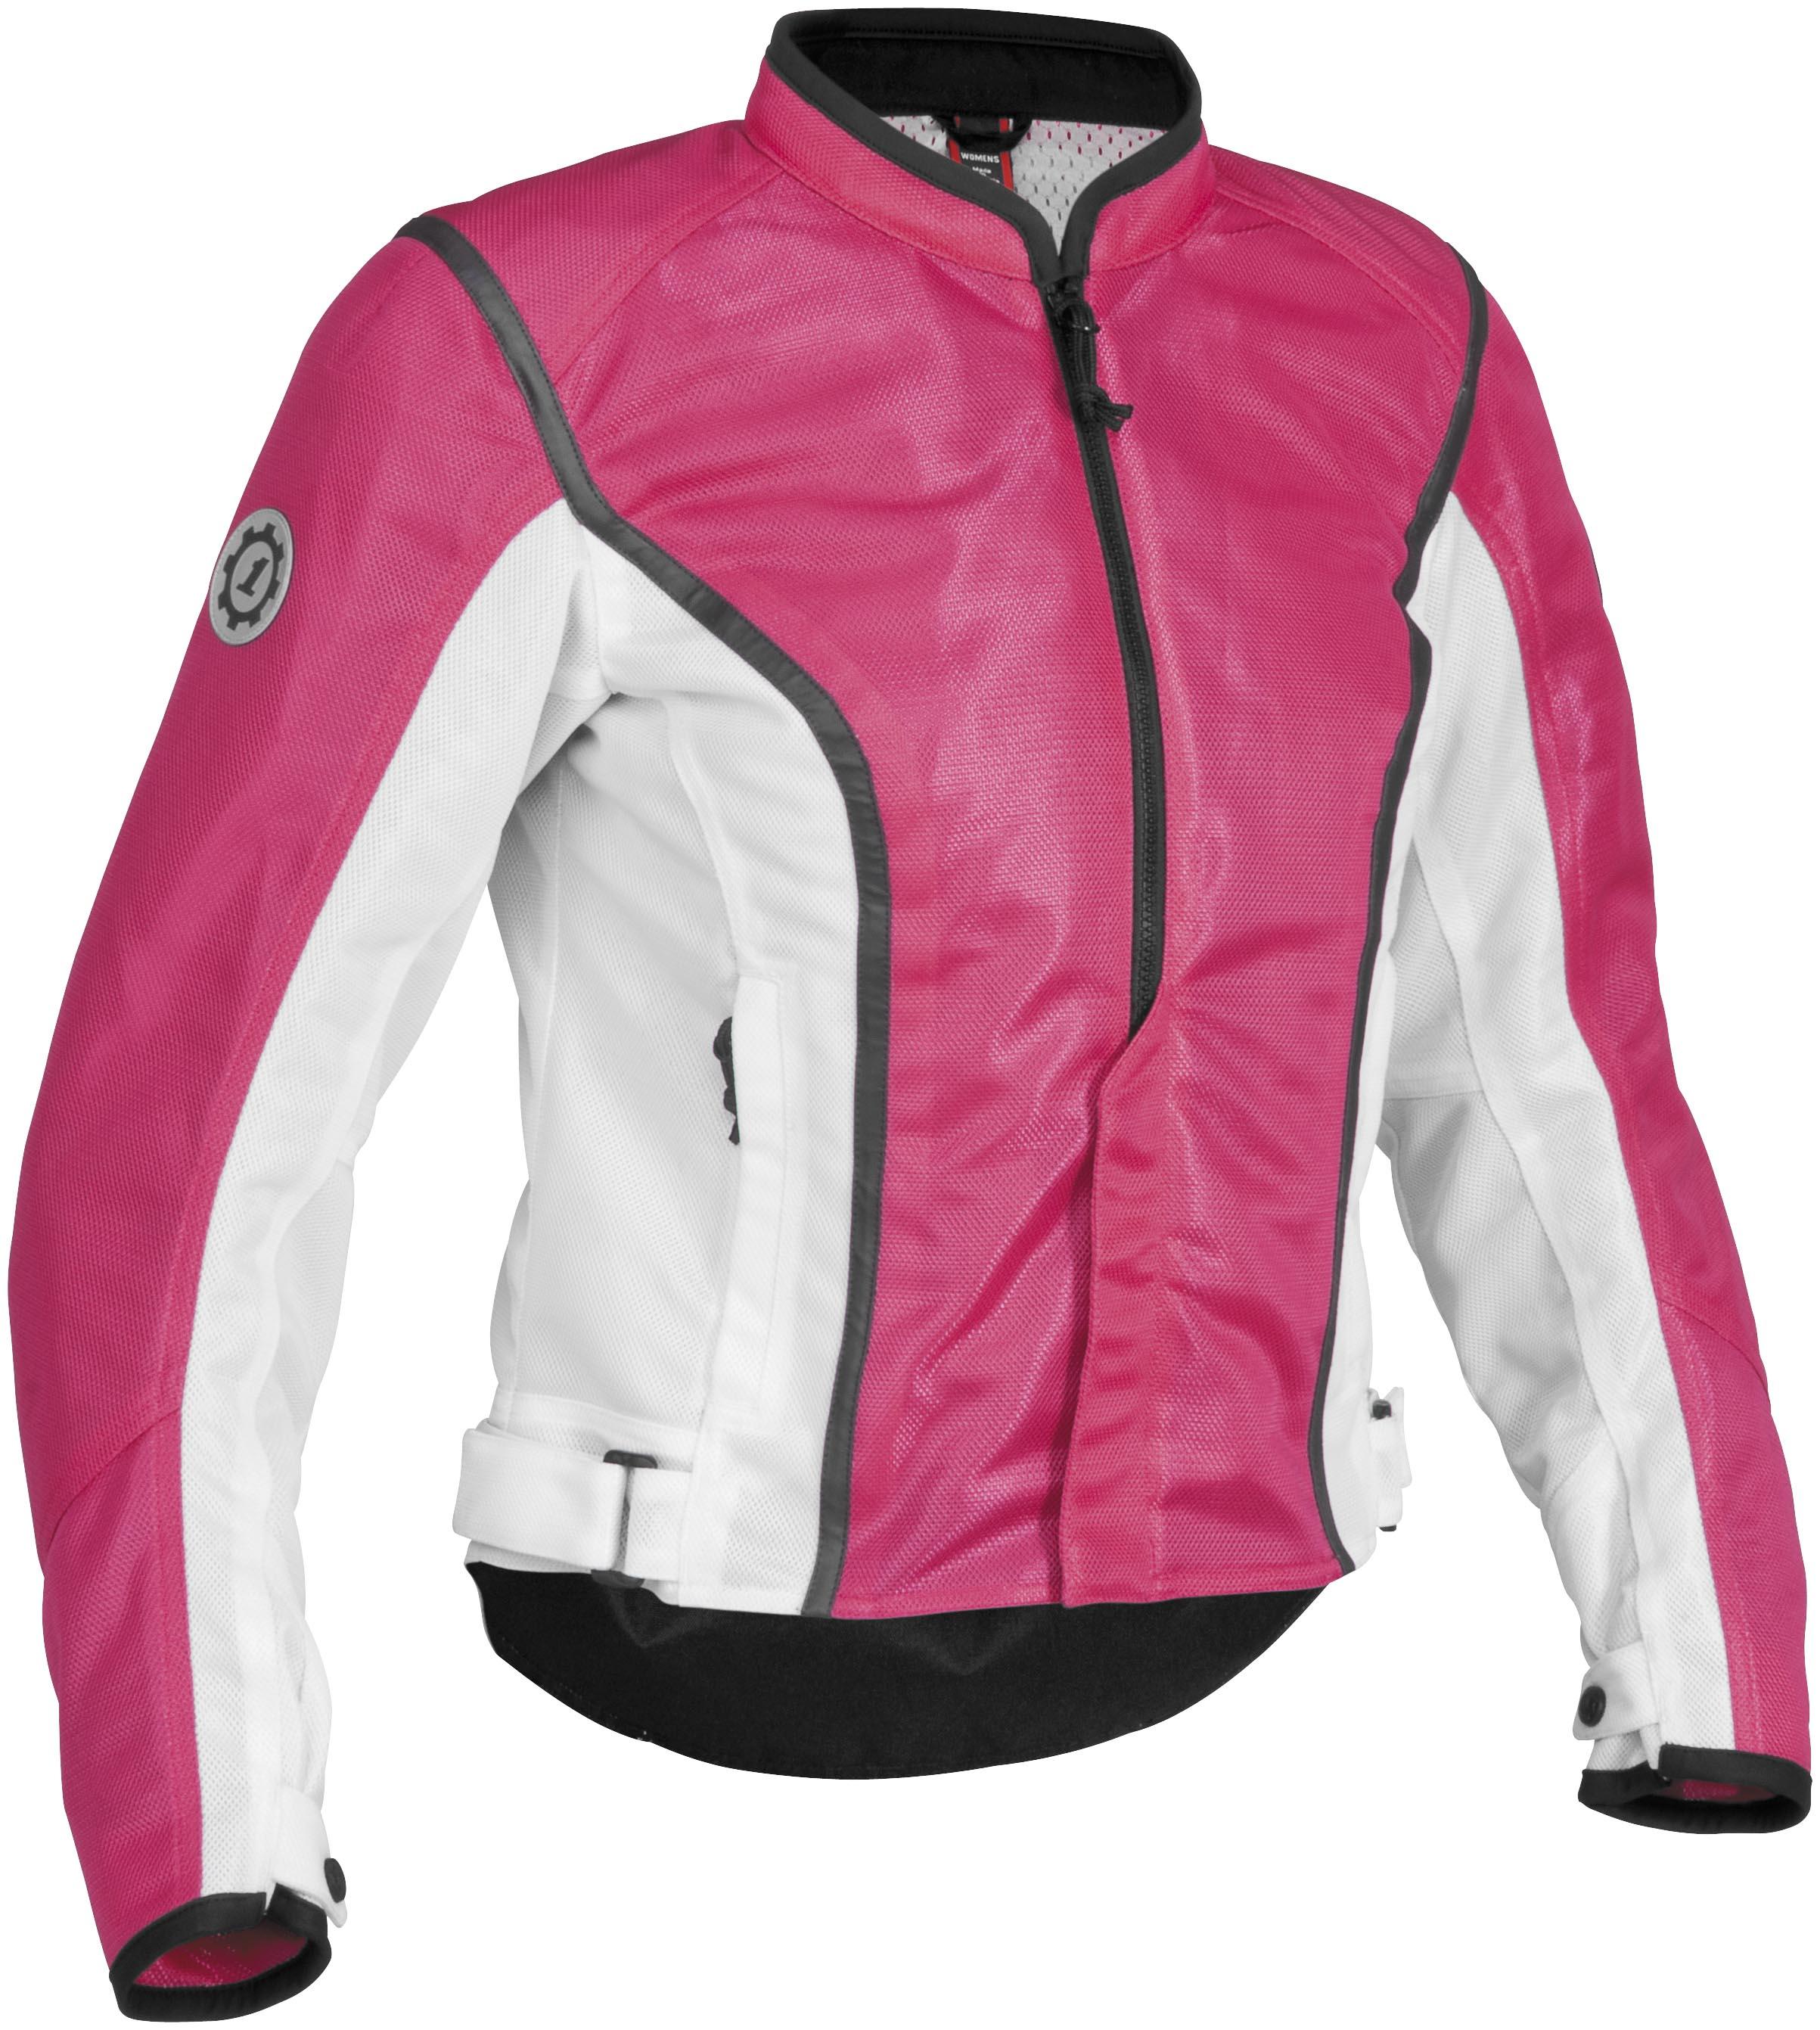 Firstgear Contour Mesh Womens Motorcycle Jacket Pink